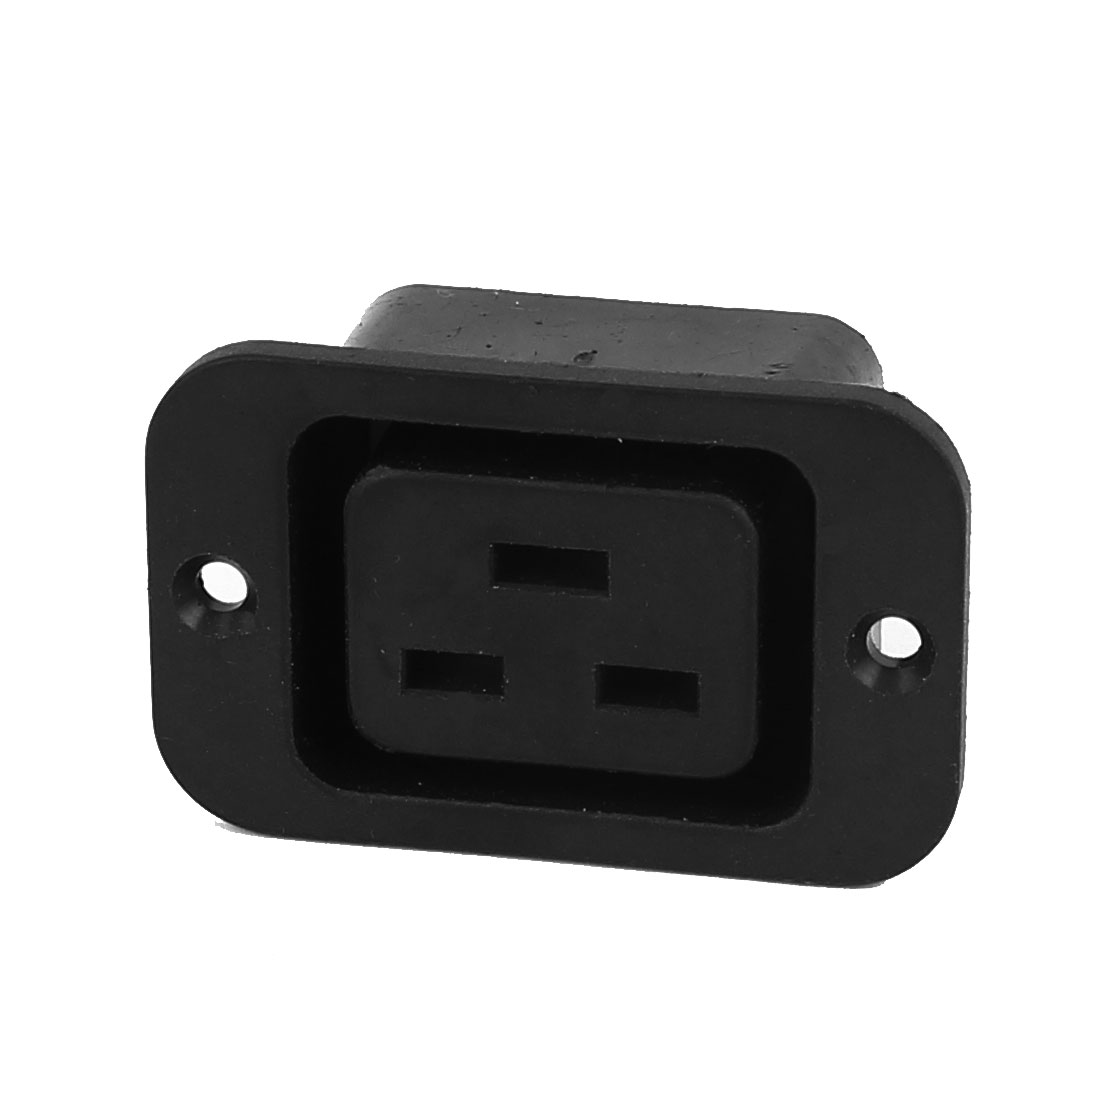 AC 250V 15A Rewirable IEC320 Series C20 Female Socket